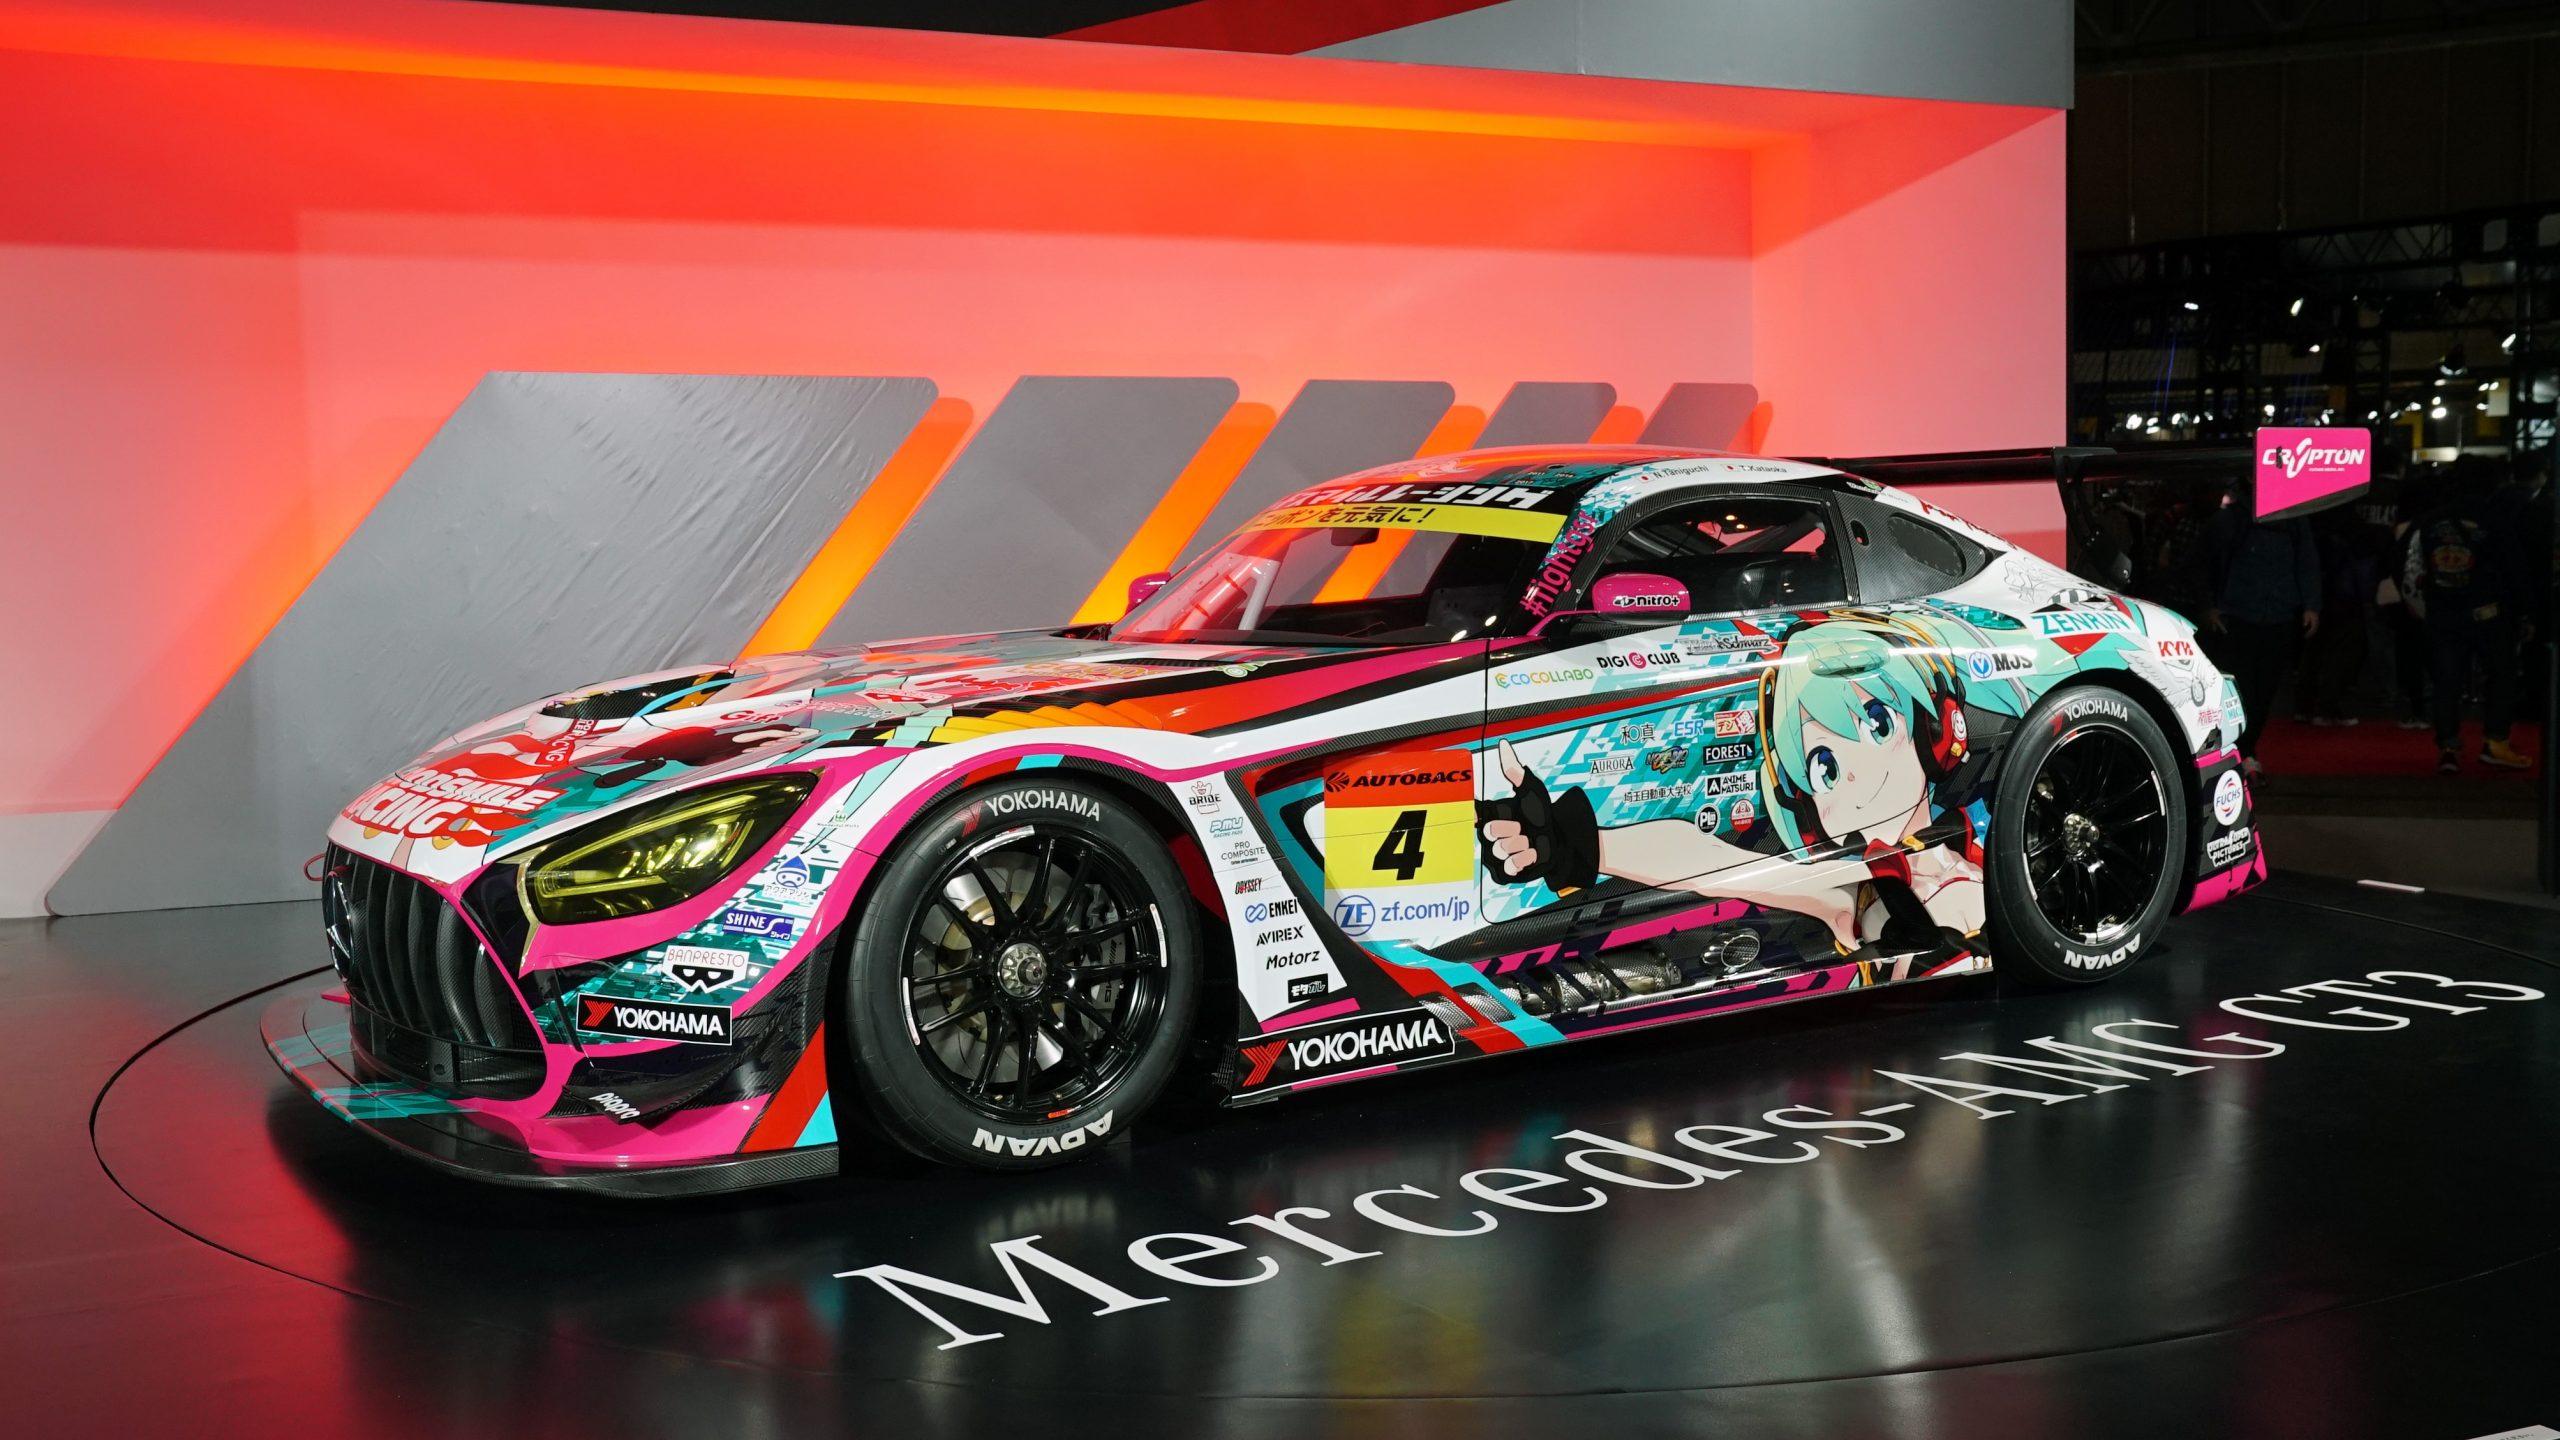 Anime Matsuri Attendees Now A Part Of Japan's Super GT ...